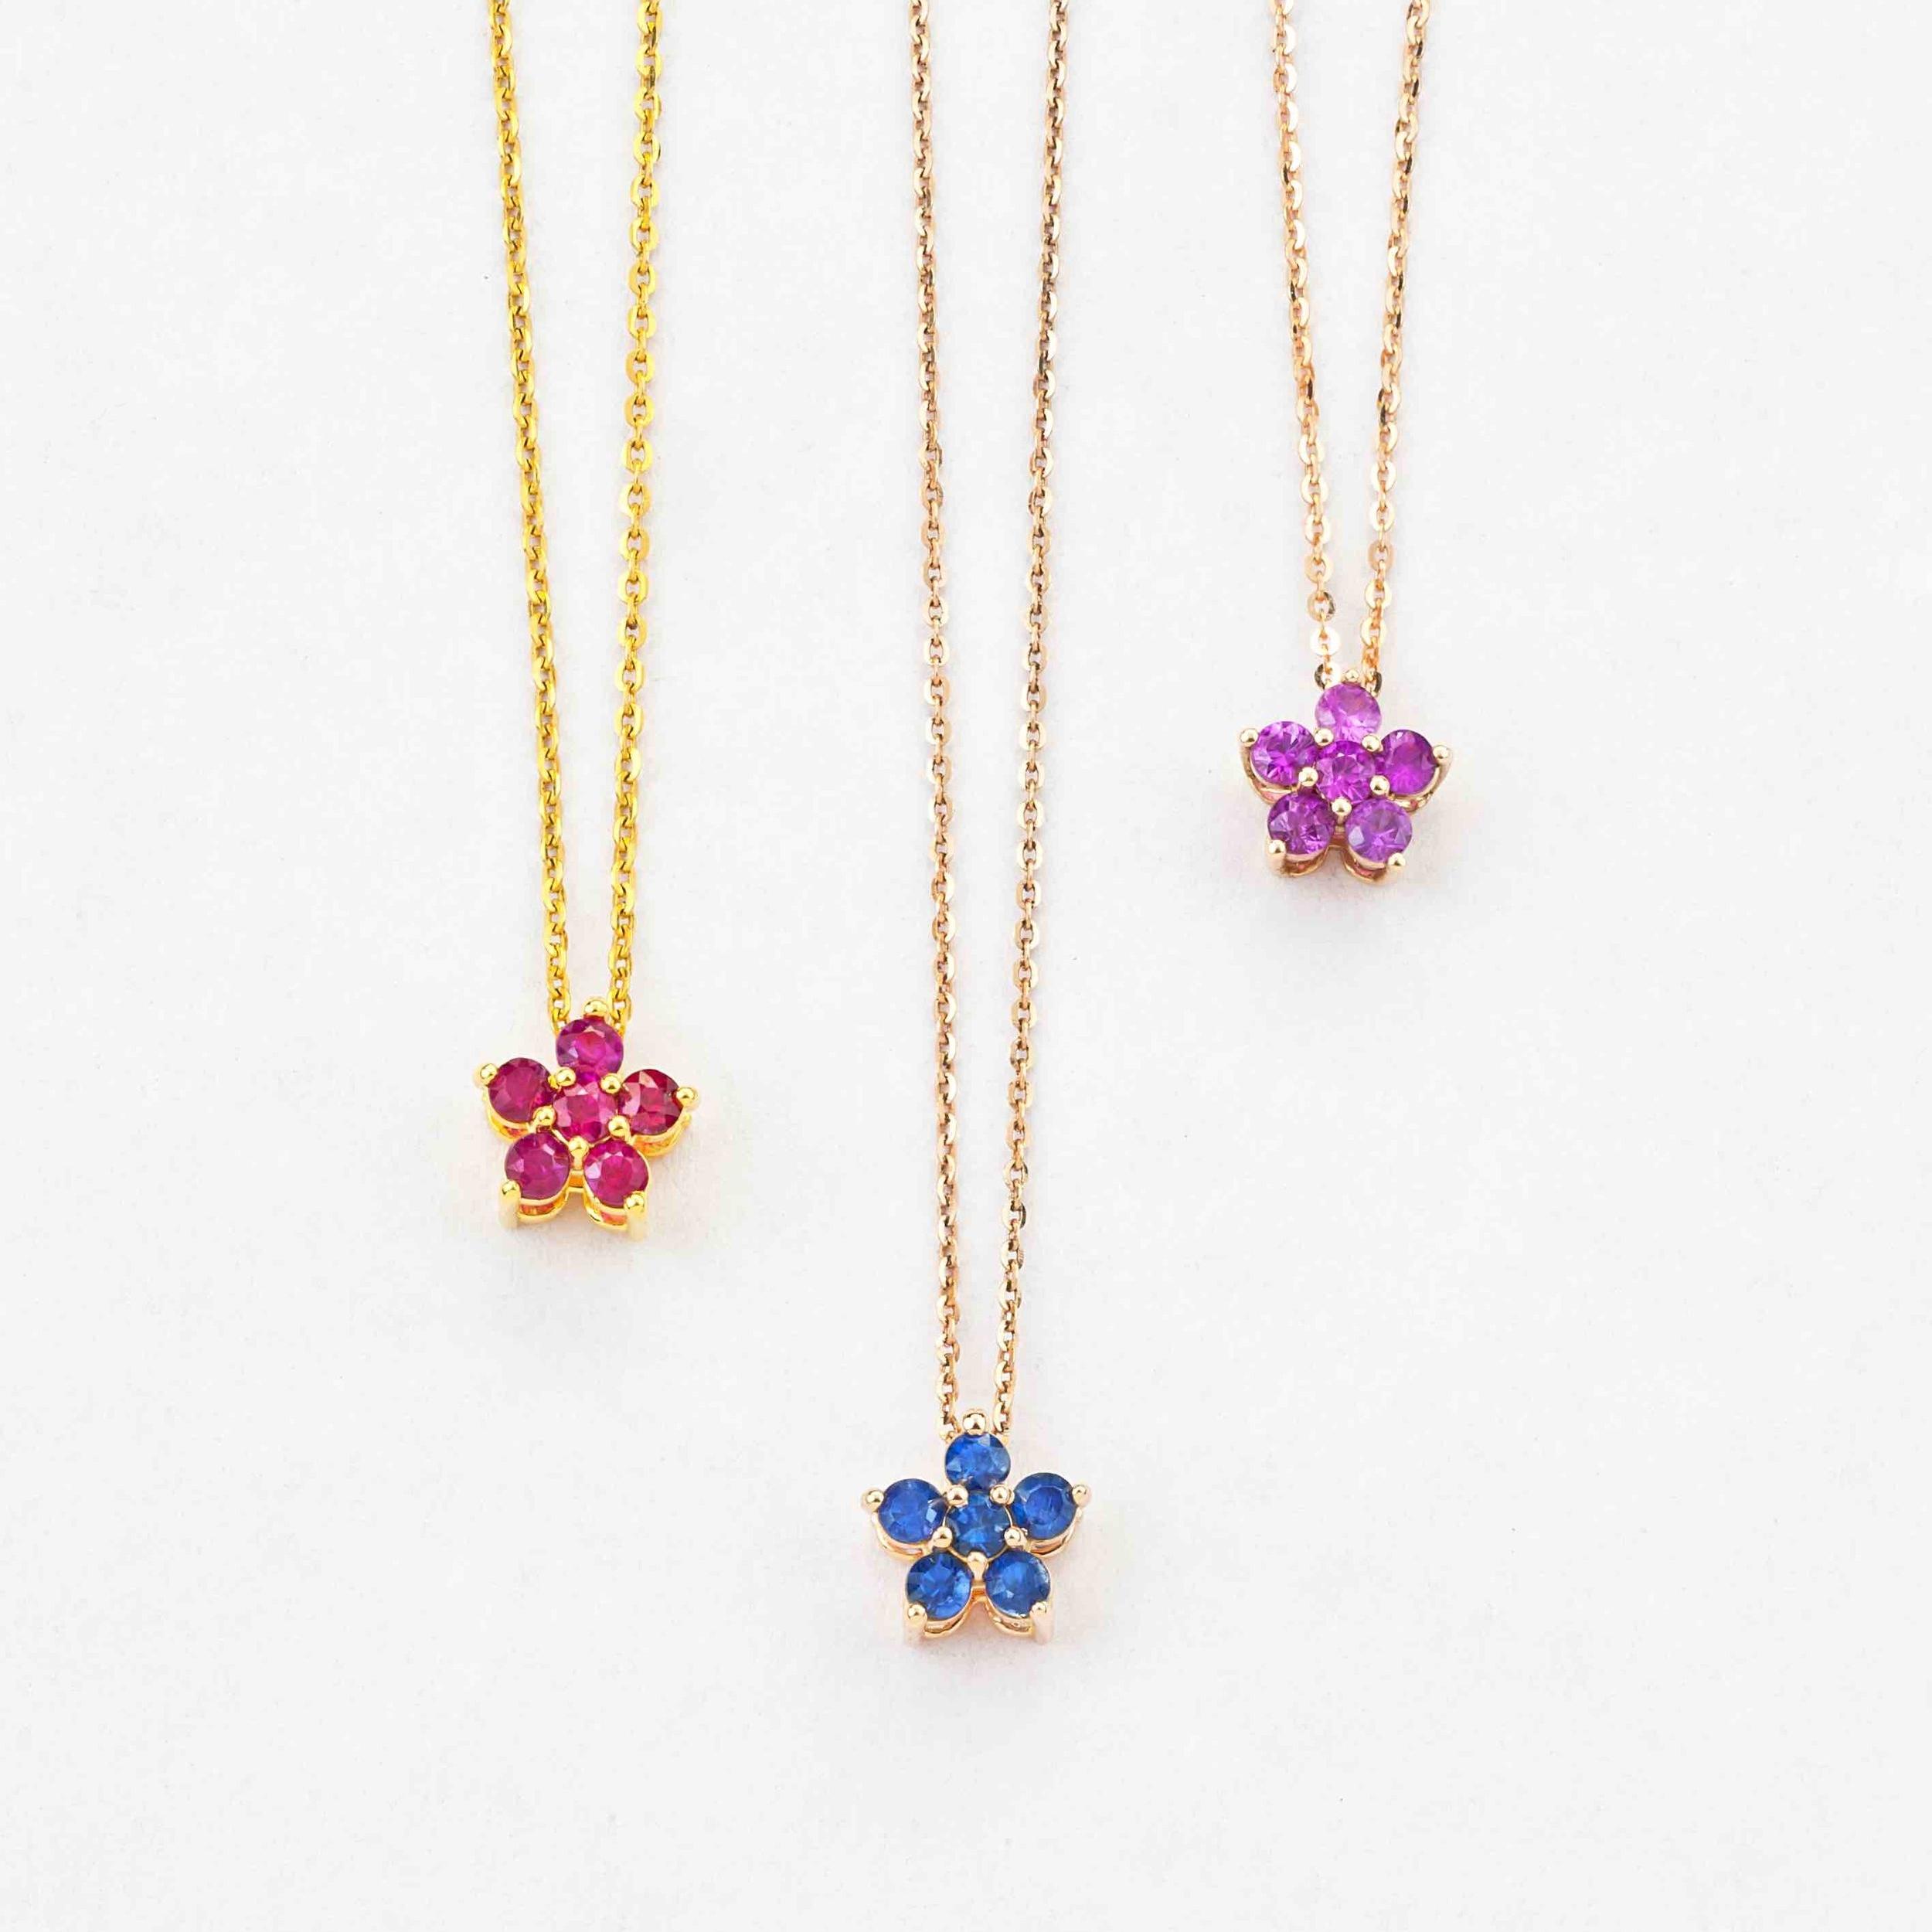 Mia Ruby Star pendants